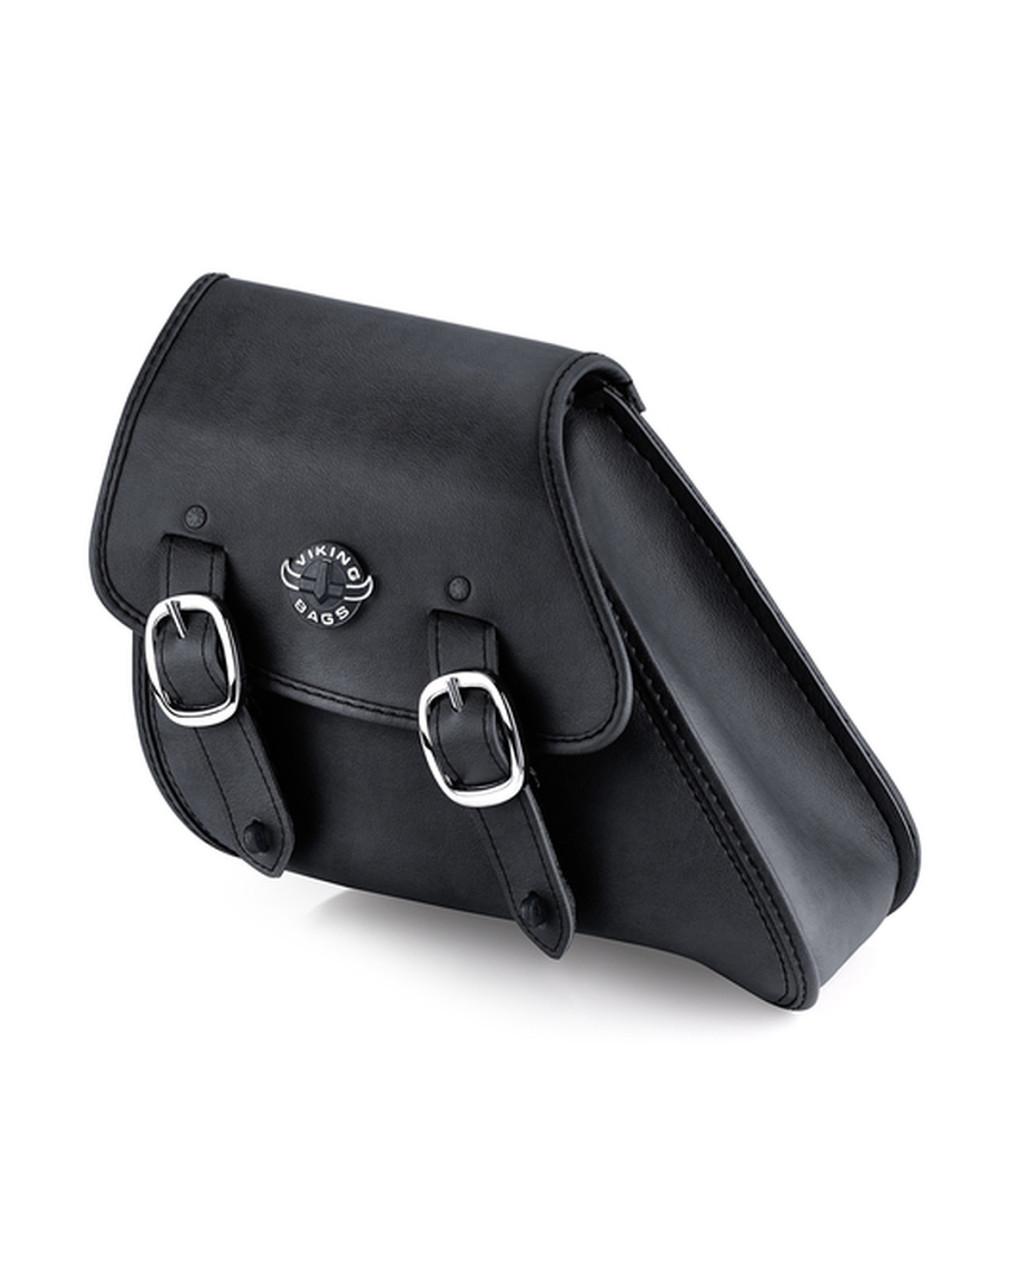 VikingBags Dyna Motorcycle Black Swing Arm Bag Main Bag View